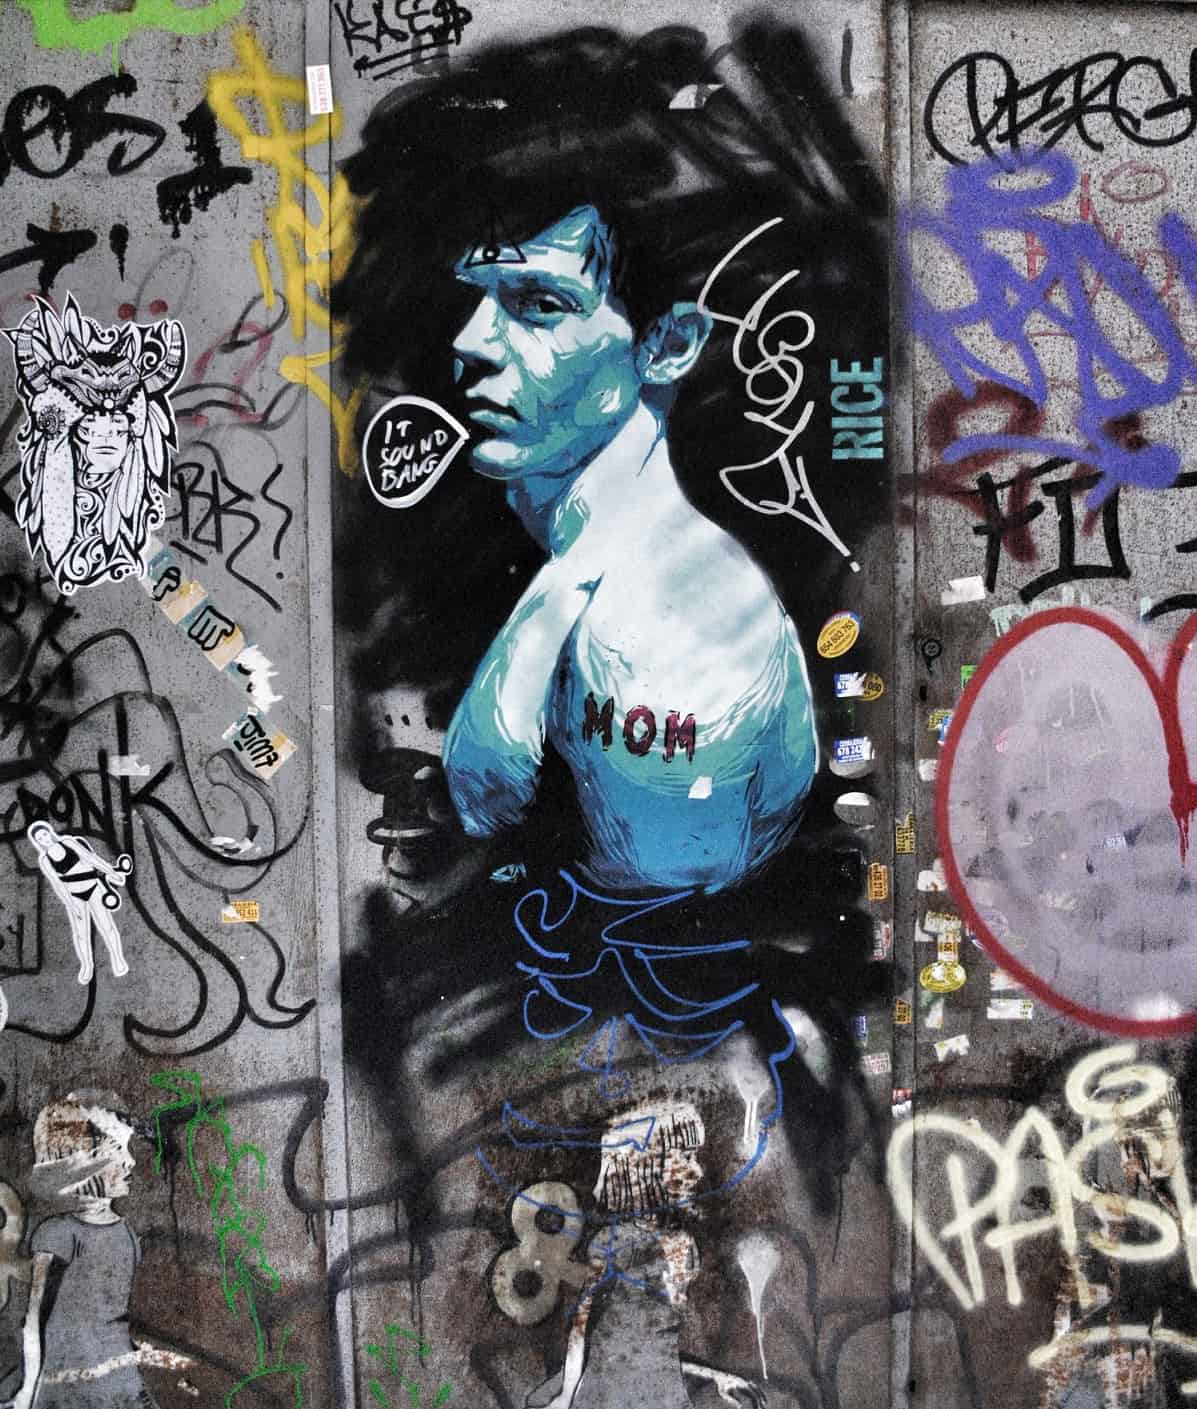 RICE Street Art, El Born, Barcelona